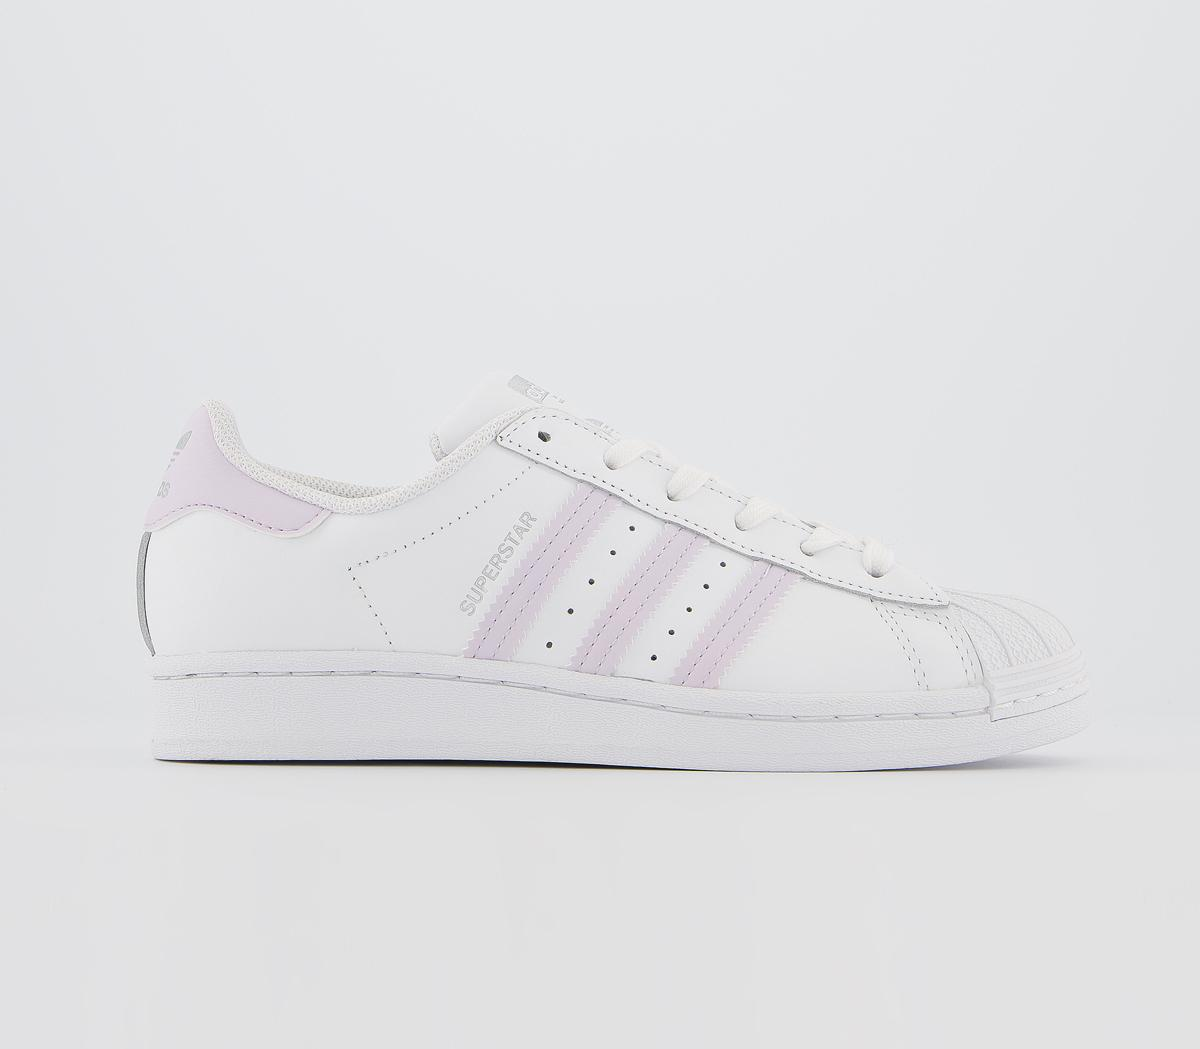 adidas Superstar Trainers White Purple